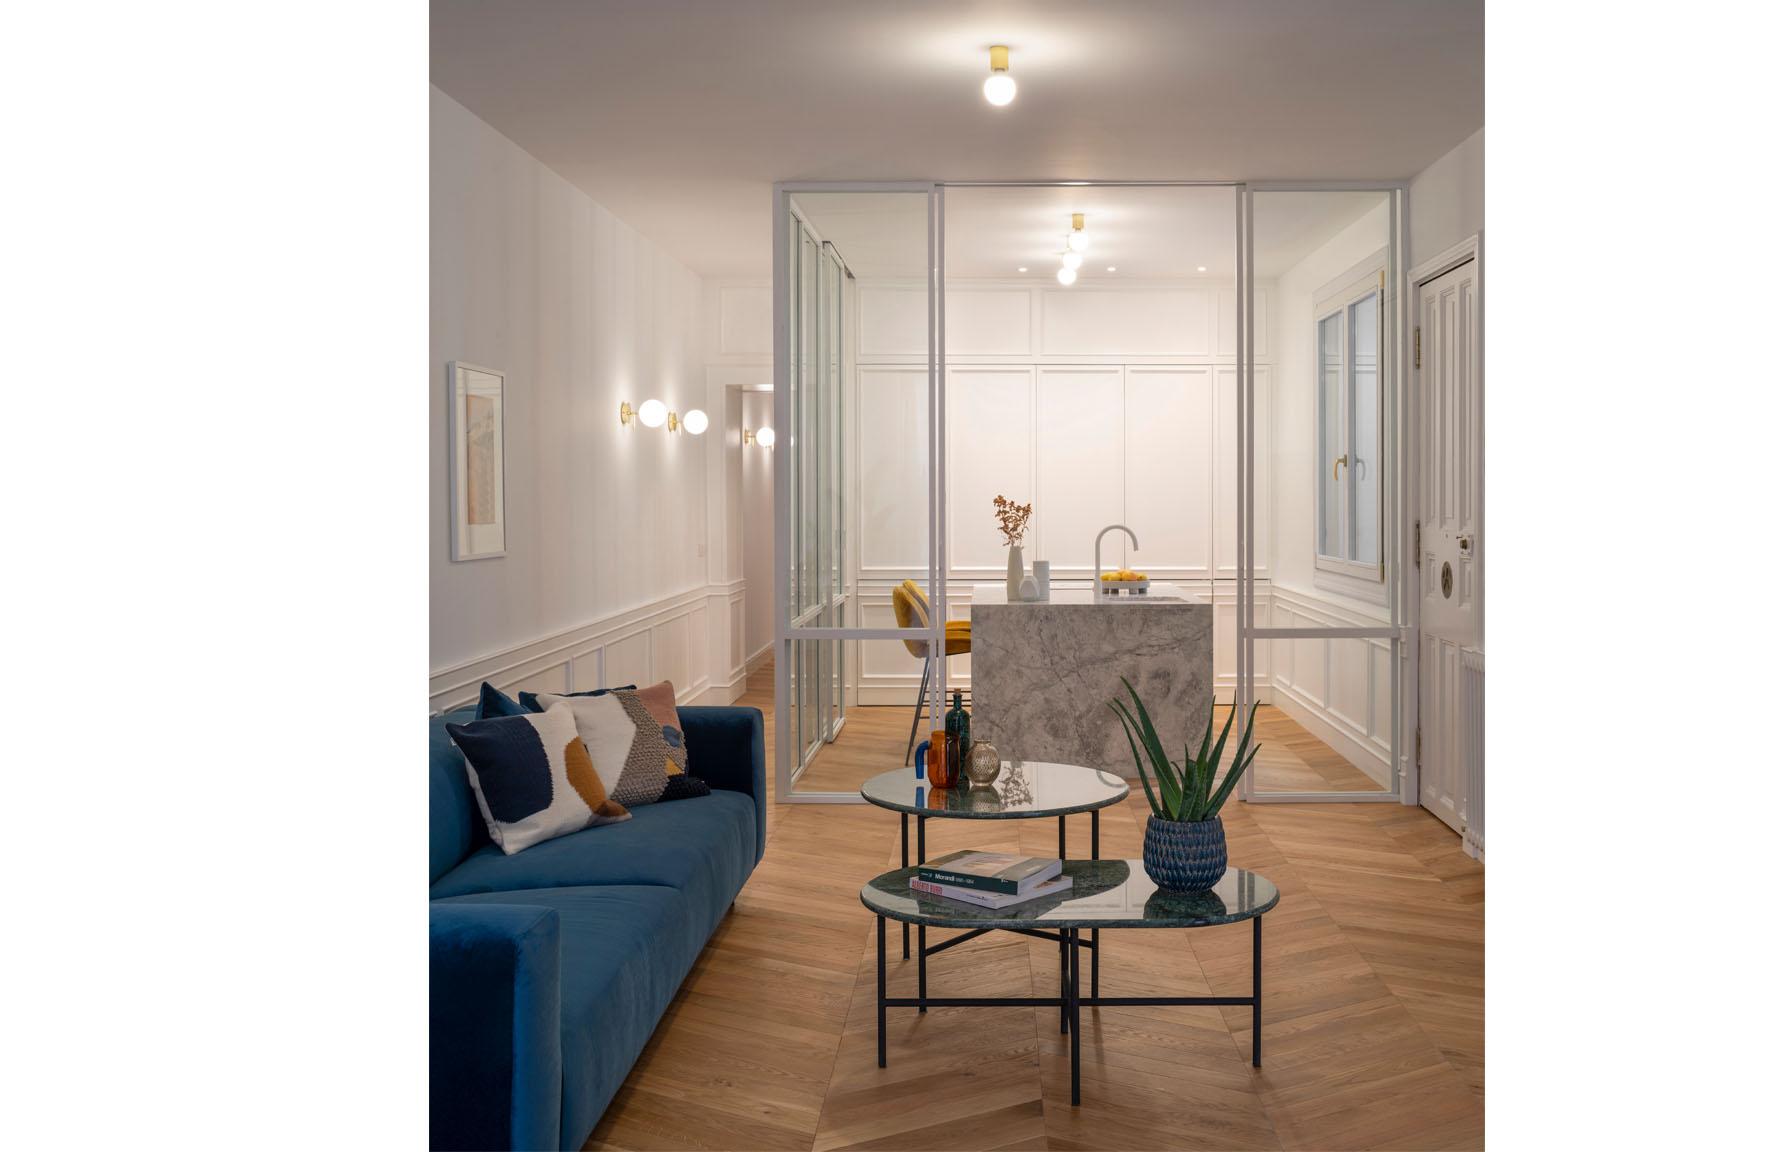 Apartment Elcano-Bilbao-Image 04.jpg